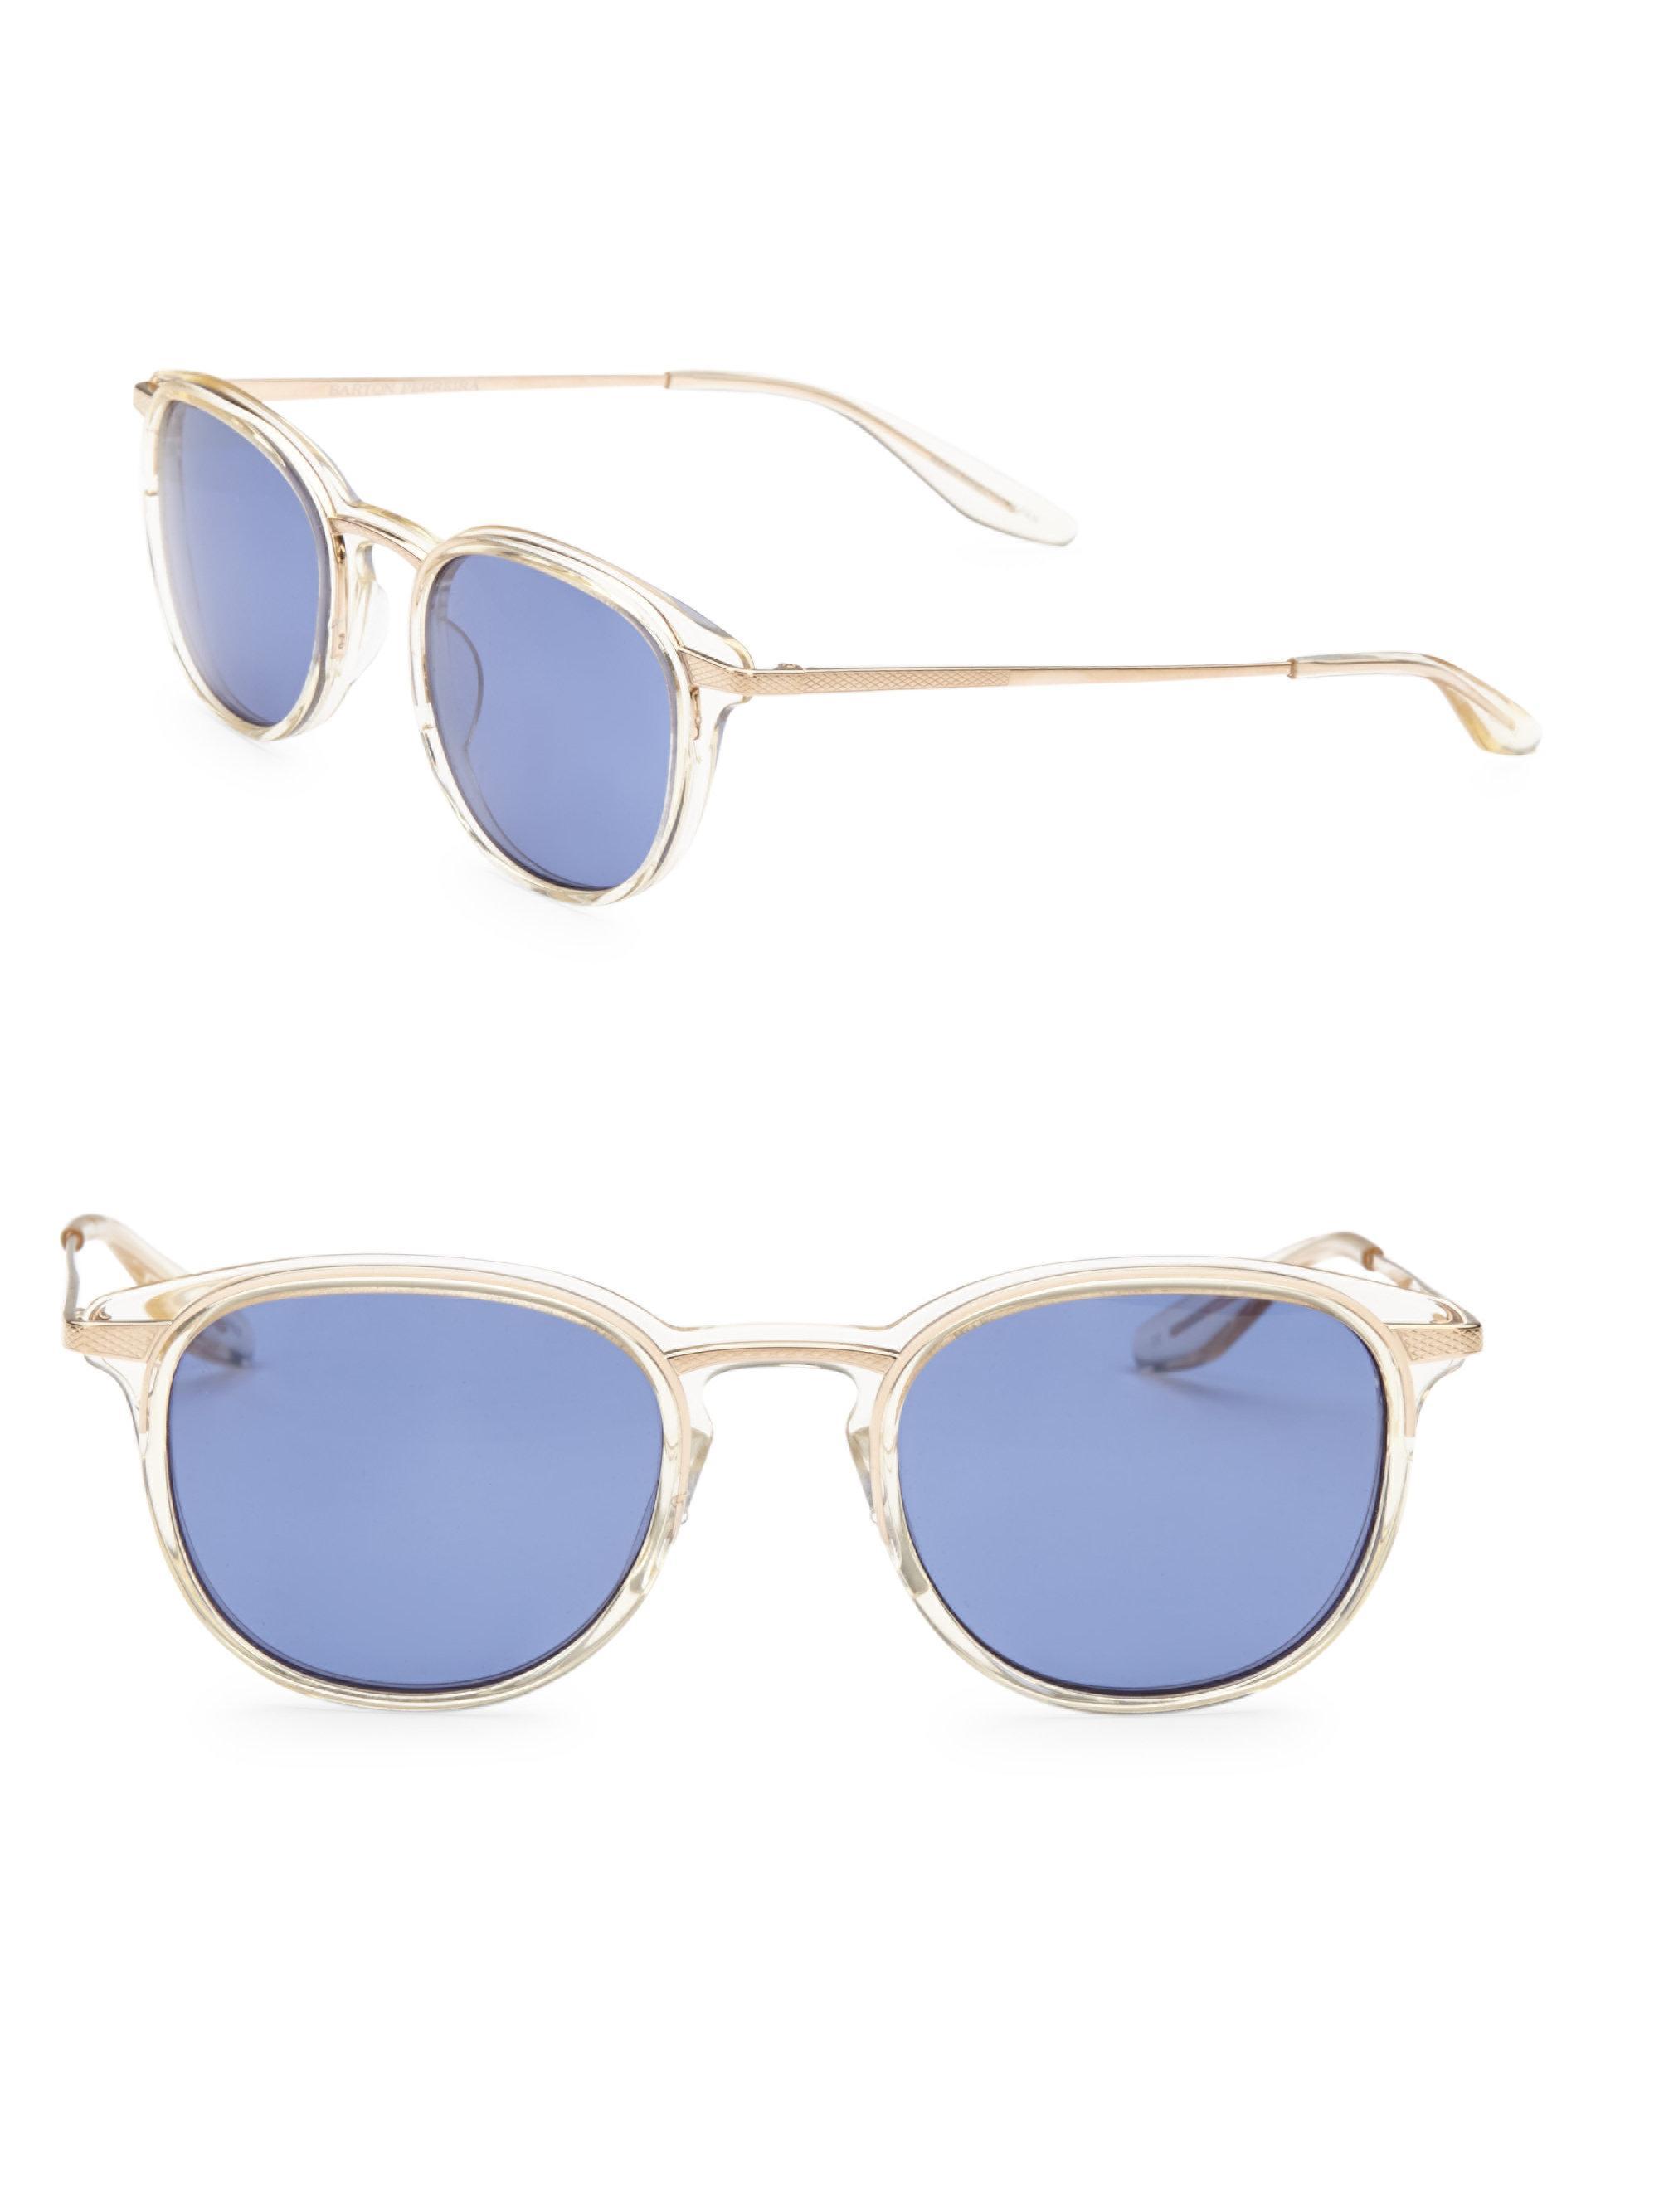 Lyst - Barton Perreira Shulman 48mm Round Sunglasses in Blue for Men